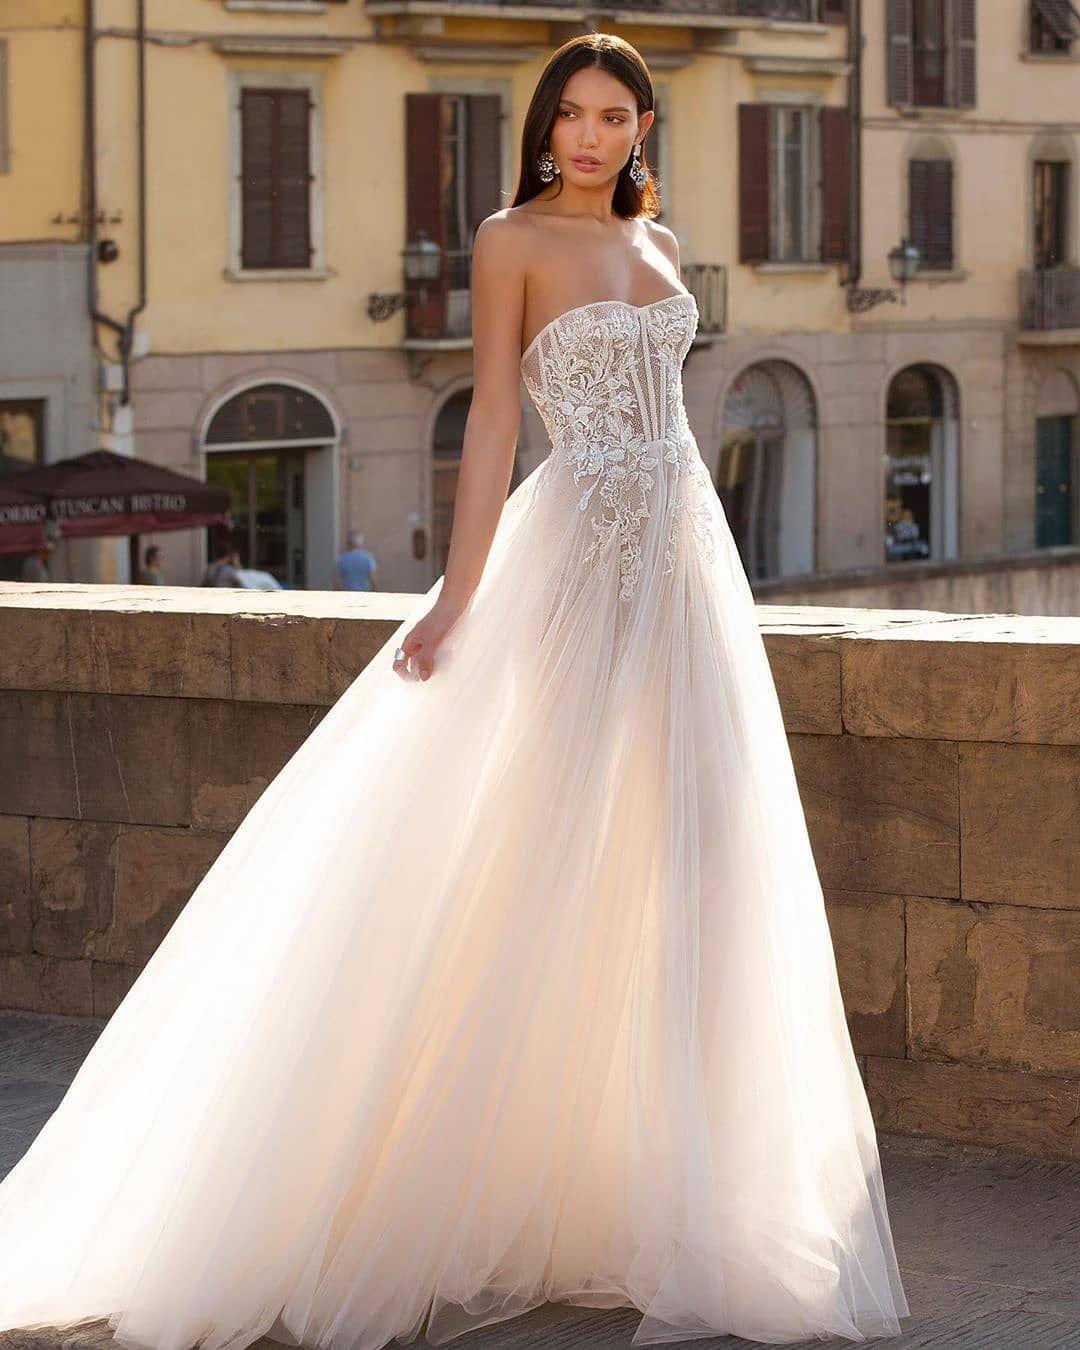 Hera Dresses On Instagram H E R A Dress By Berta Fashion Style Fashionable Newy Berta Wedding Dress Wedding Dresses Julie Vino Wedding Dress